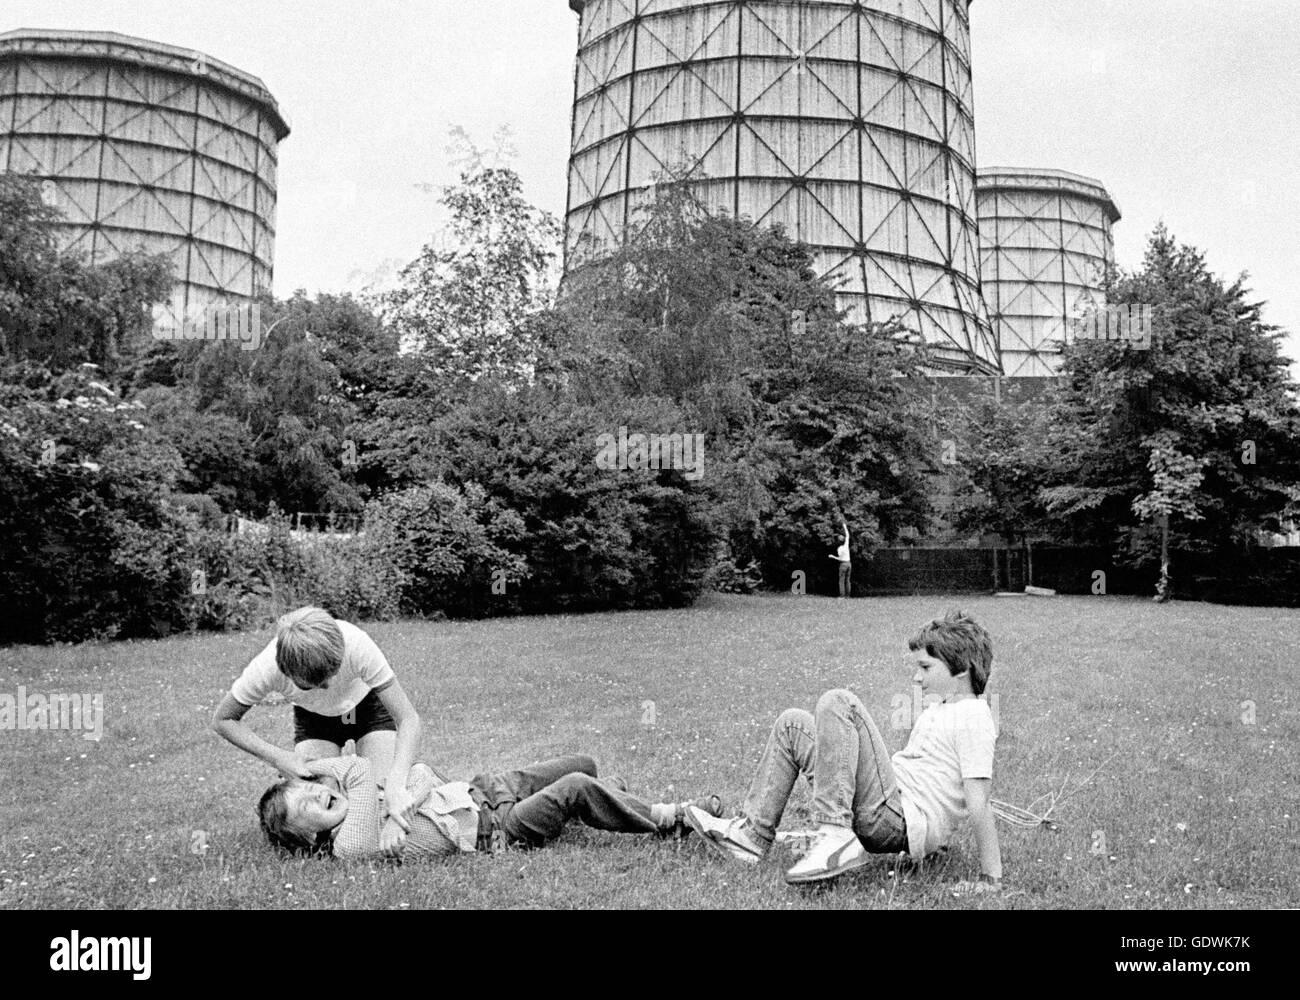 Children in the Ruhr region - Stock Image